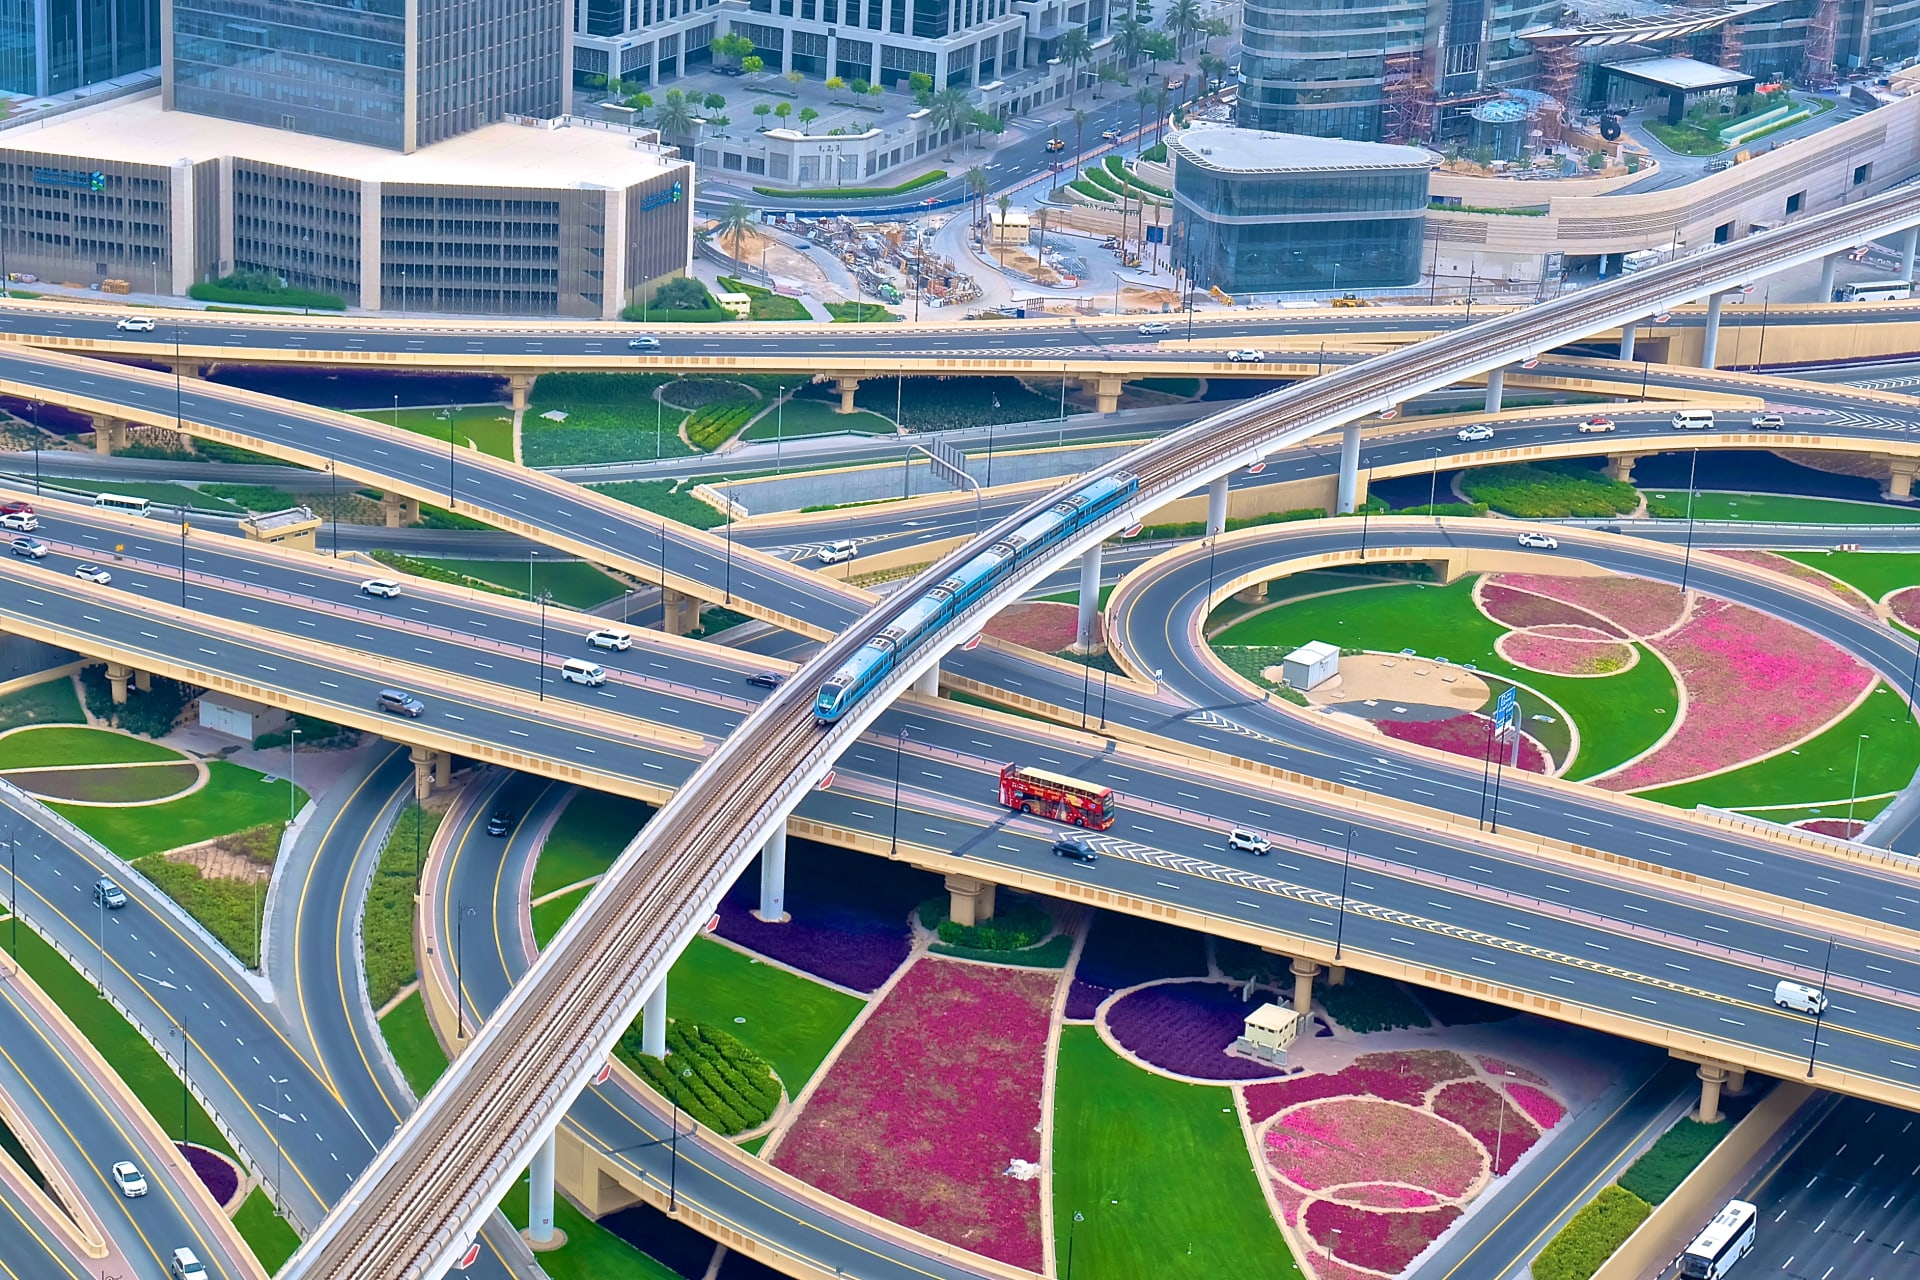 بعد مرور 10 أعوام على إطلاقه.. هكذا تبدو سكك مترو دبي